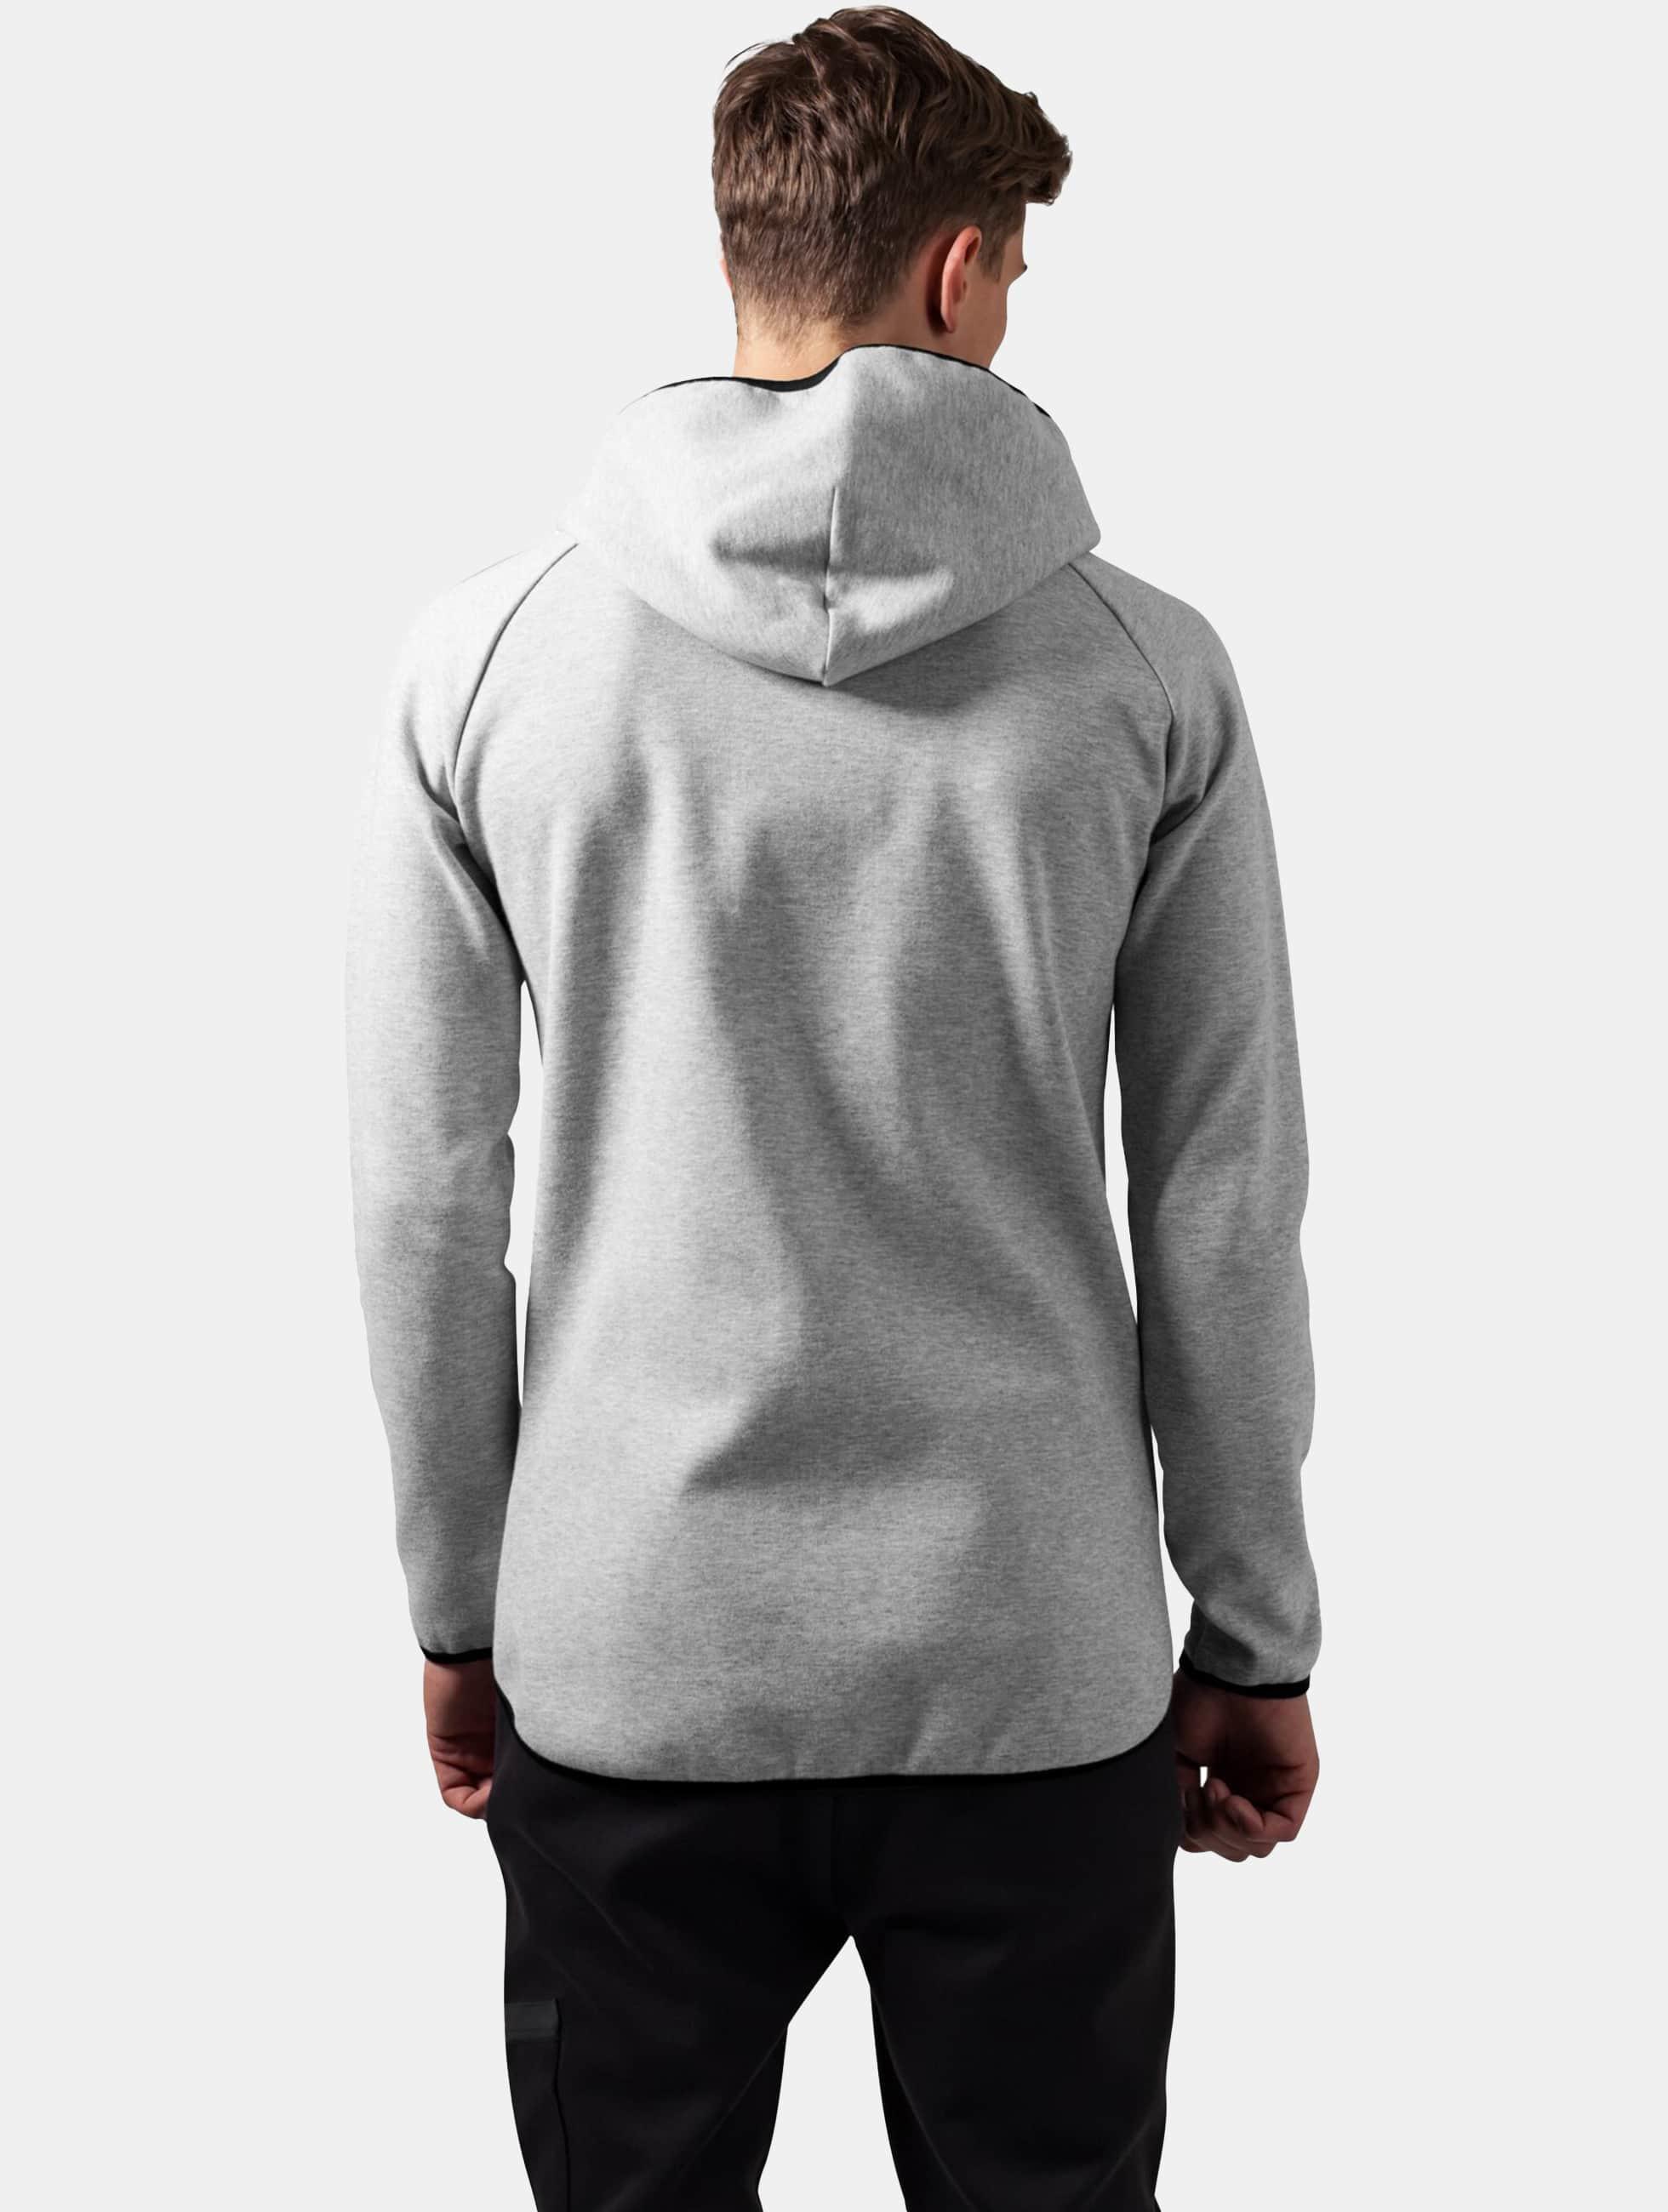 Urban Classics Zip Hoodie Athletic High Neck Interlock grey